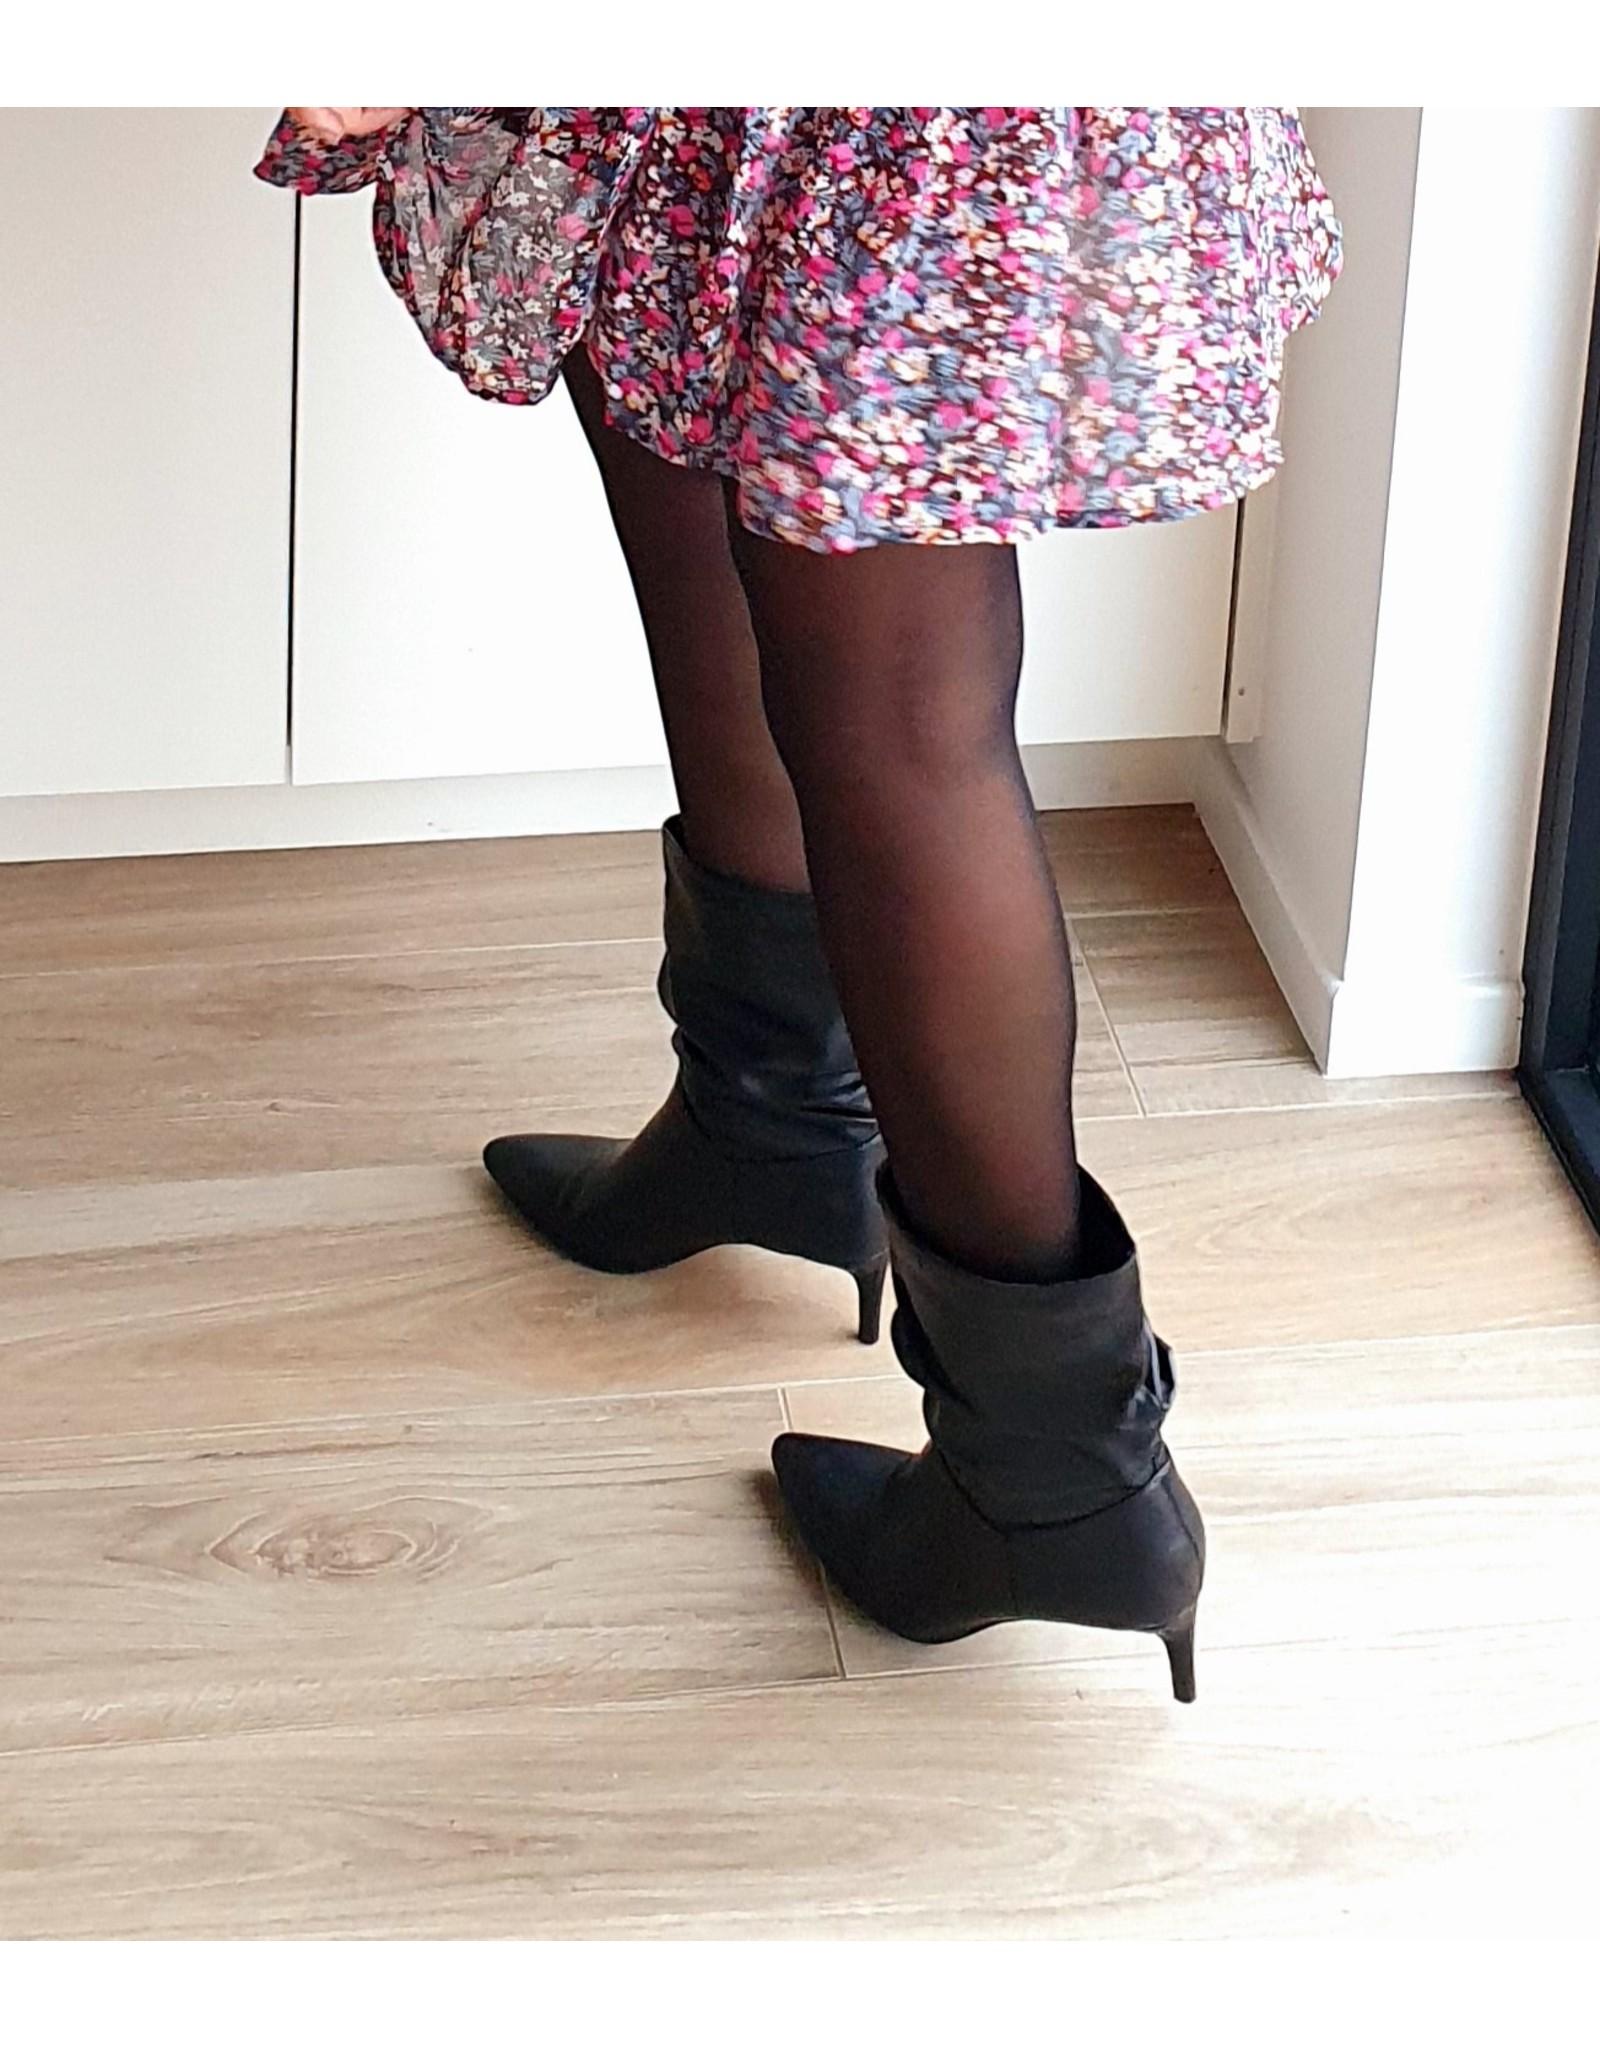 Black classy boots